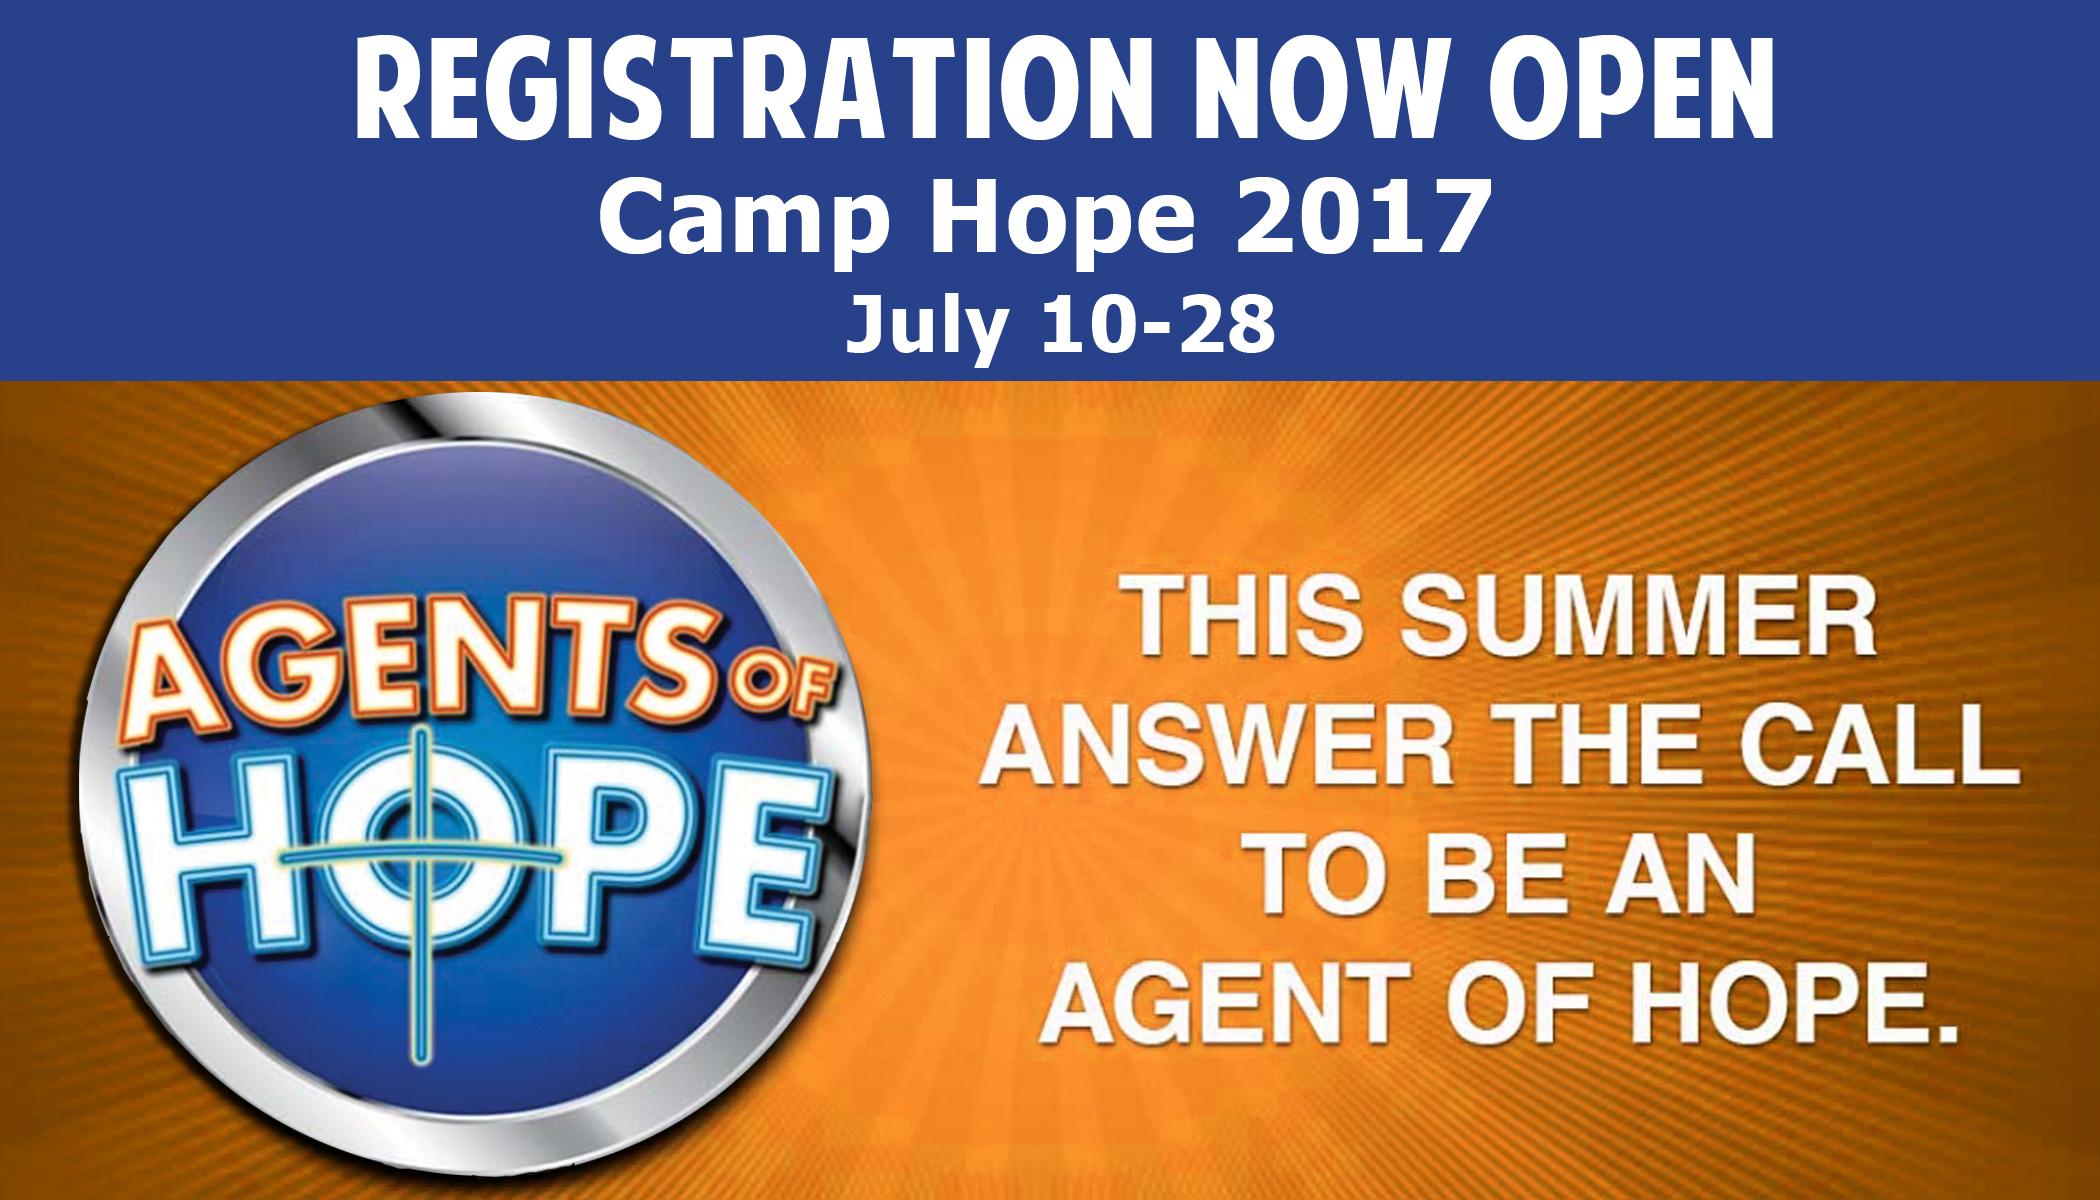 Camp-Hope-2017 Agents of Hope Camp Registration Open